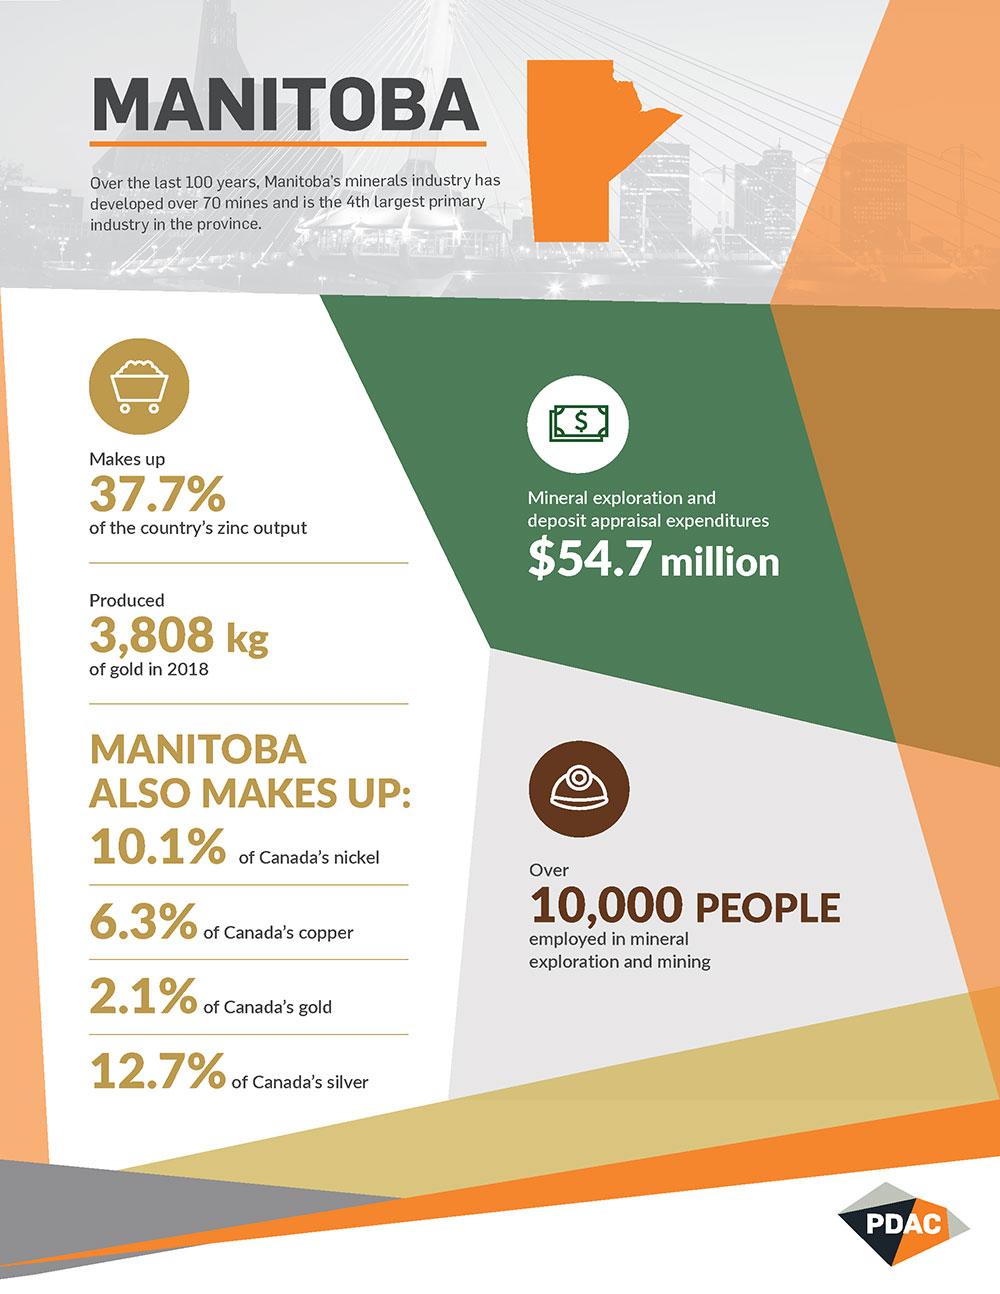 PDAC-Manitoba